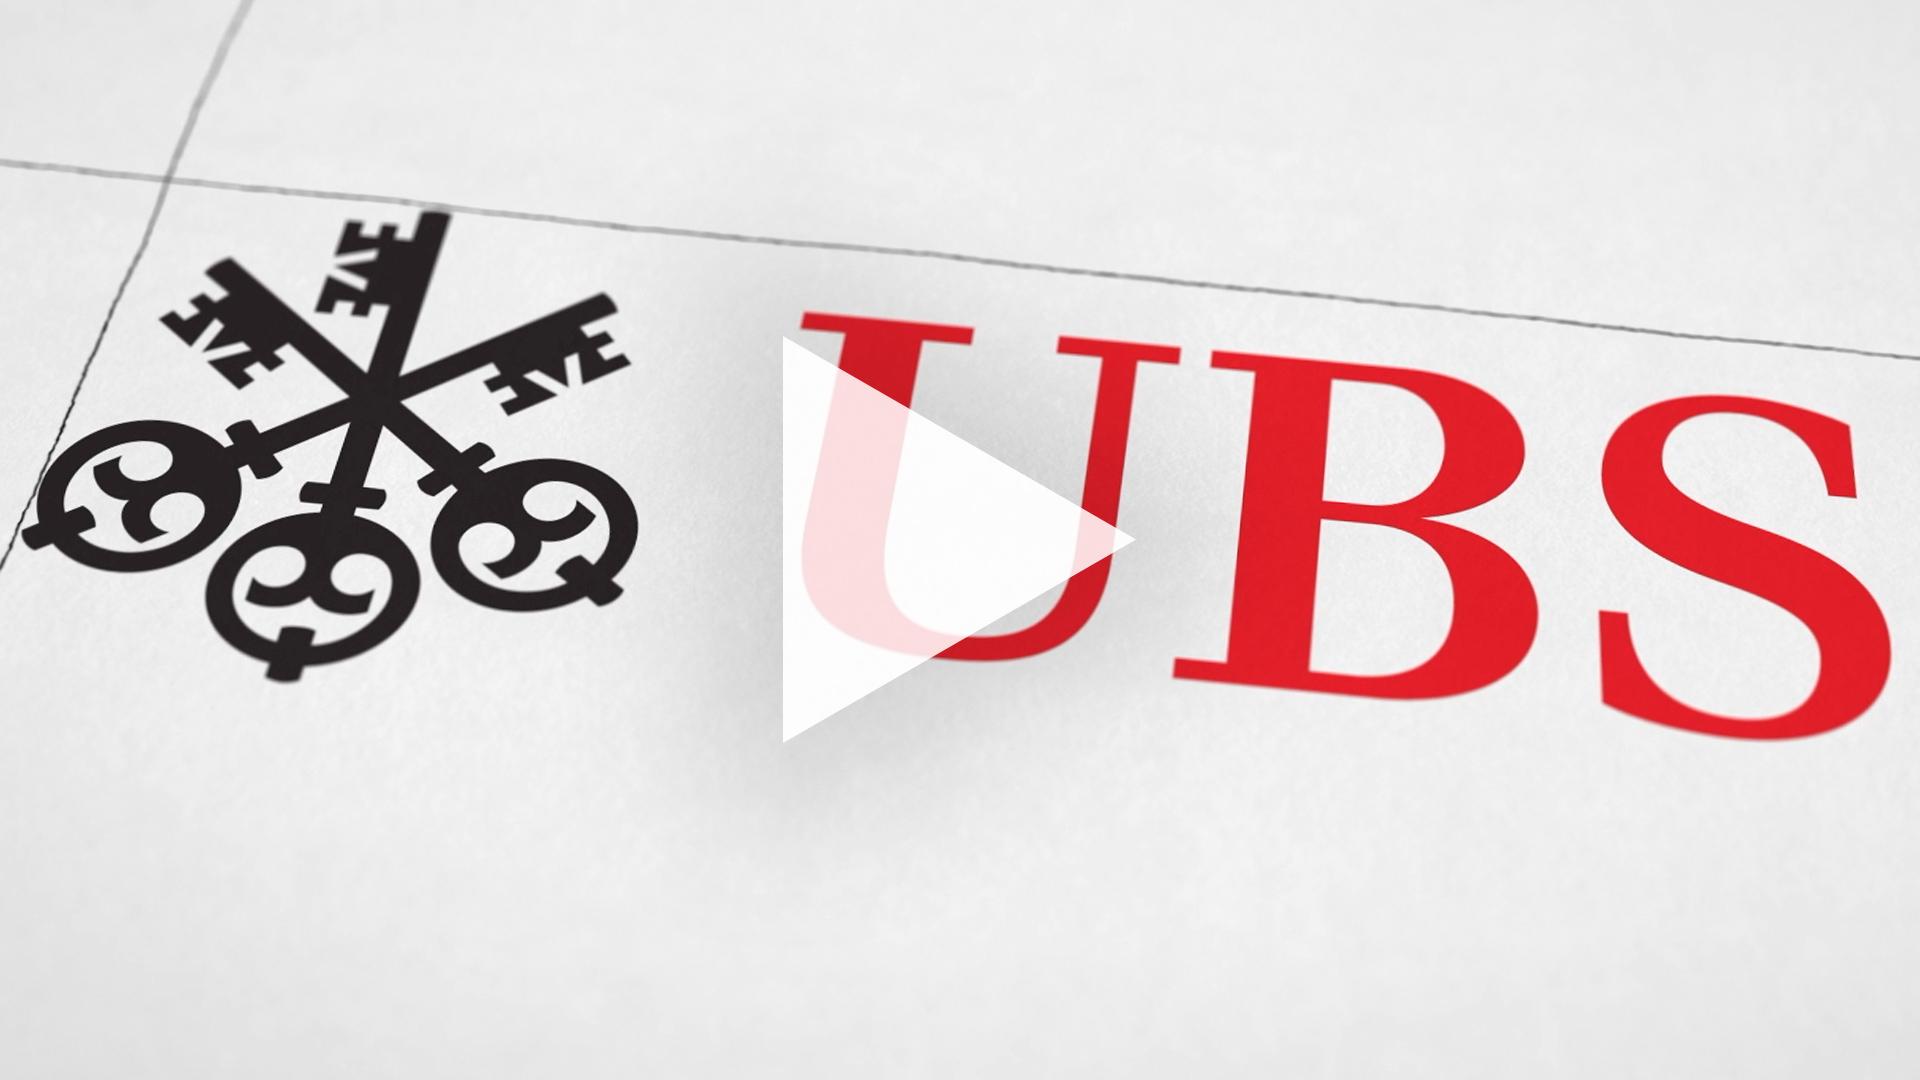 Pfeil-Thumbnail-UBS-Brandvideo